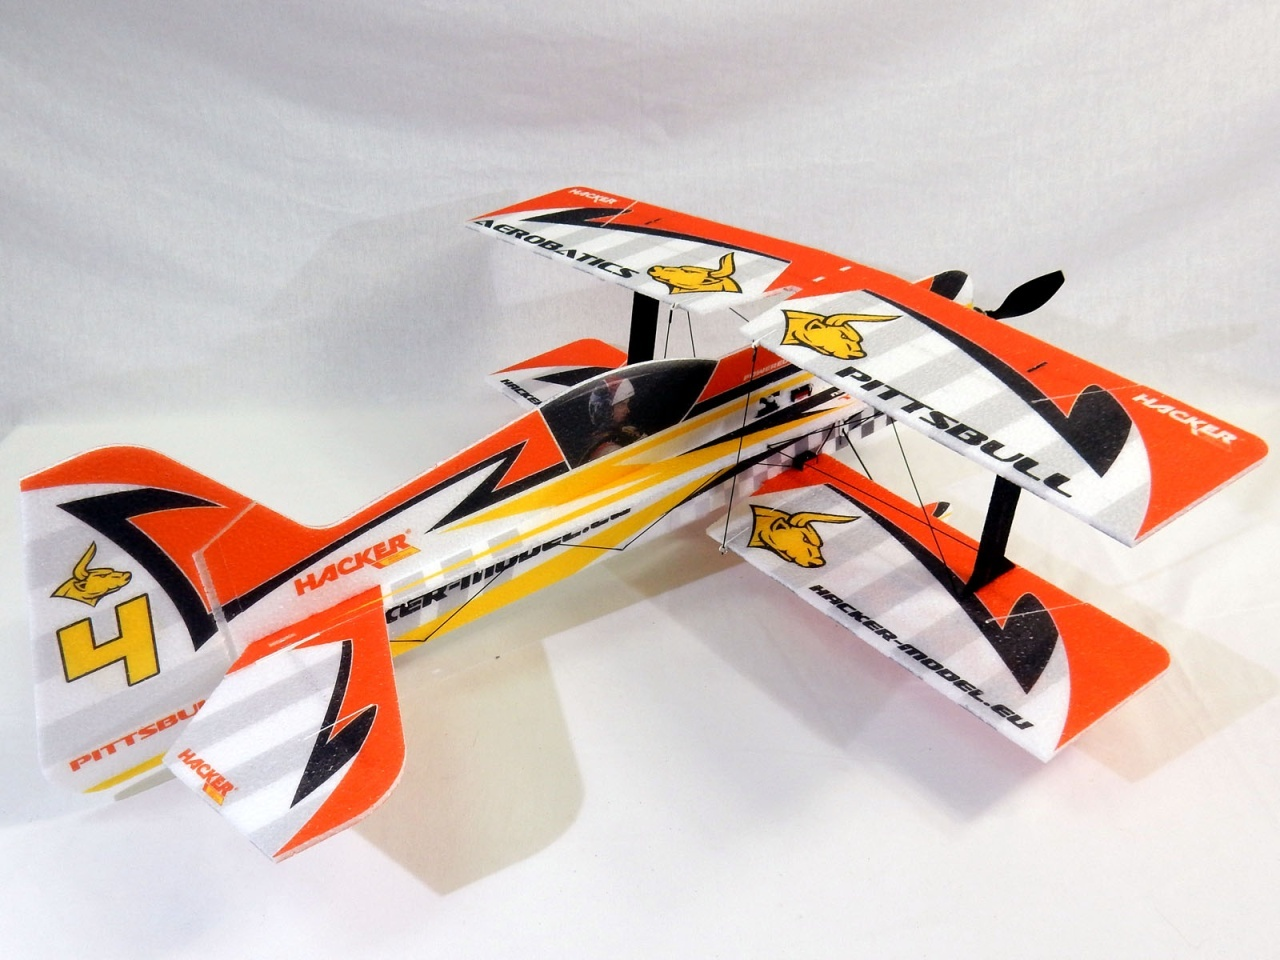 NEU Hacker Pittsbull ARF Combo - 75 cm incl. Antrieb+Servos